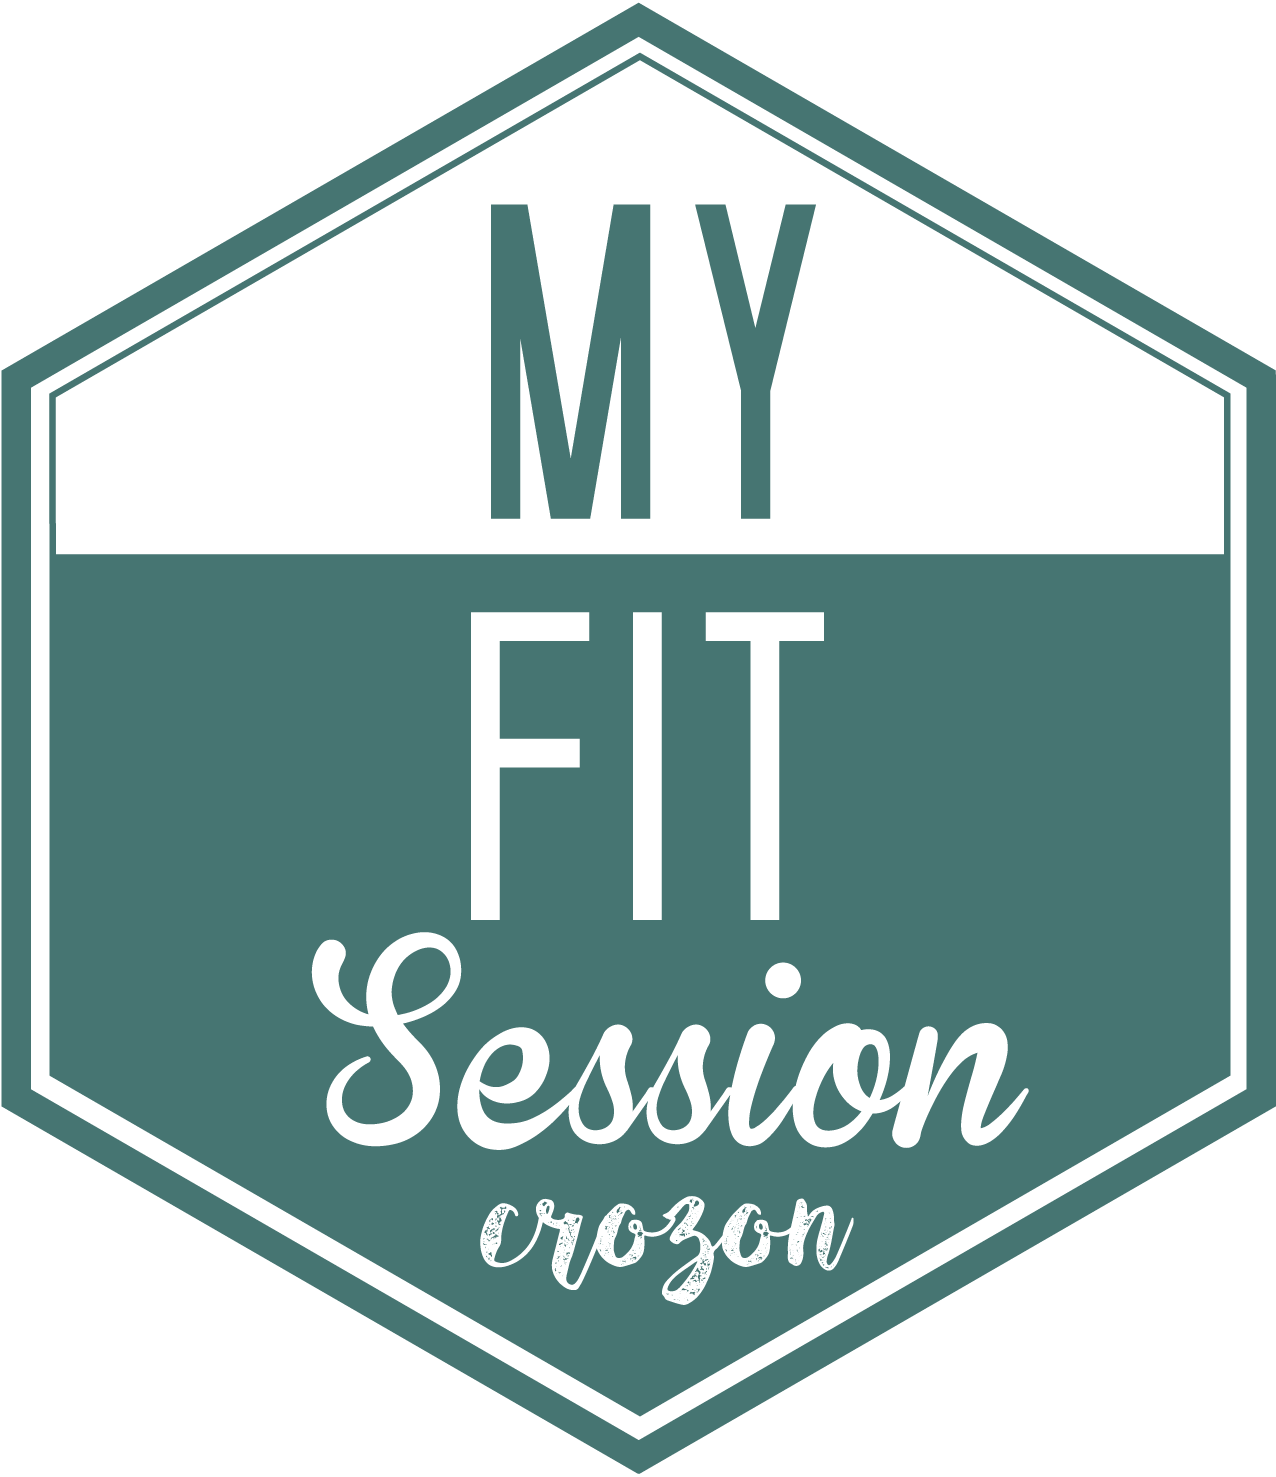 MyFitSessionCrozon